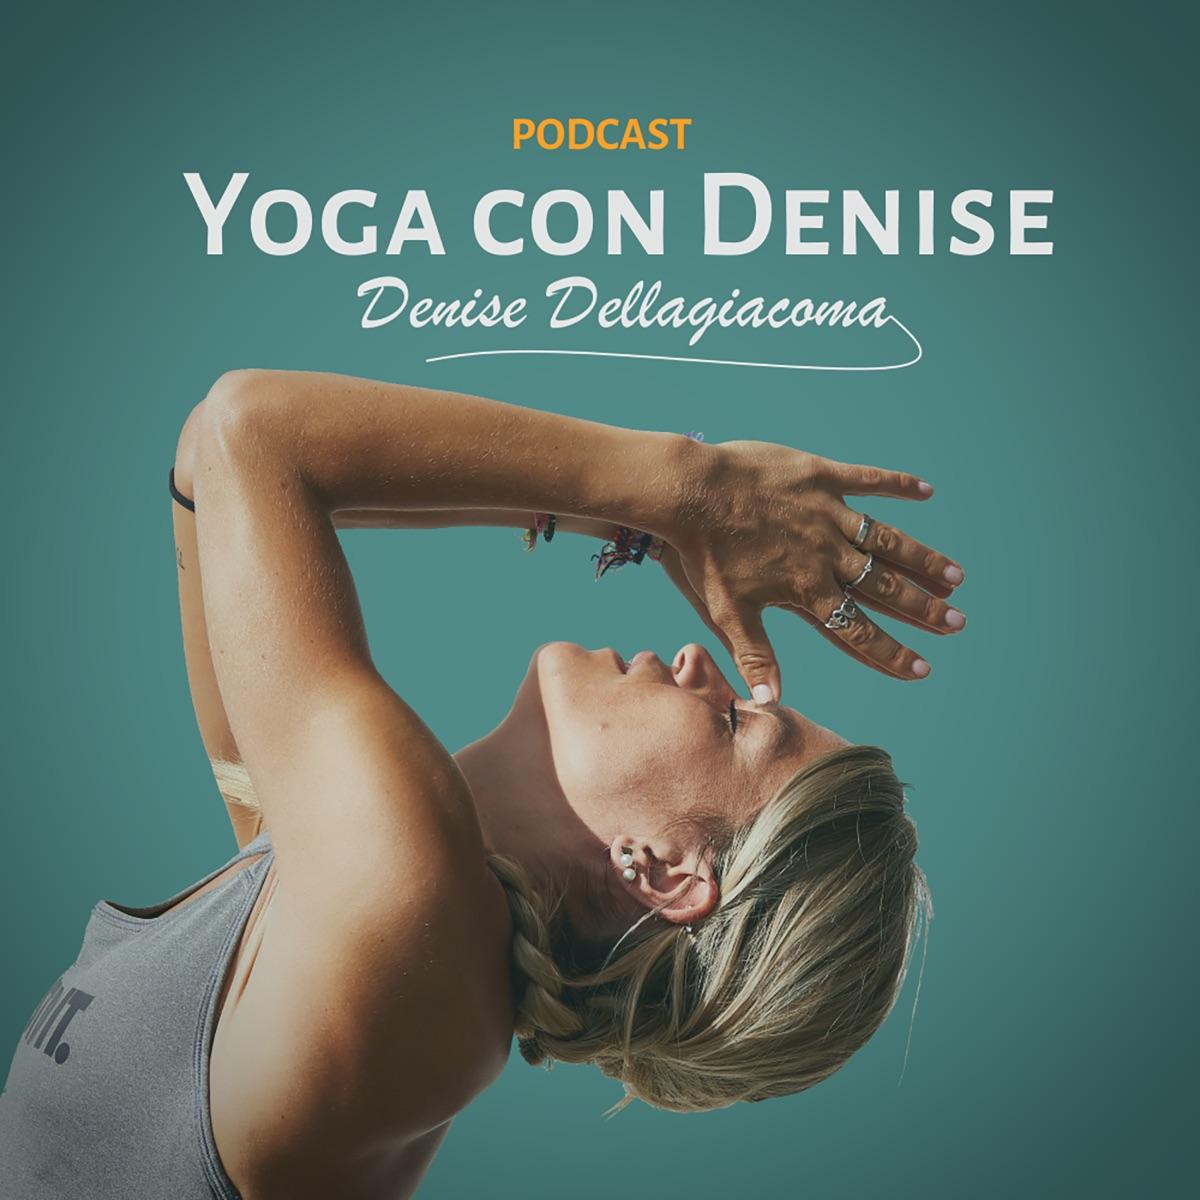 Yoga con Denise Podcast